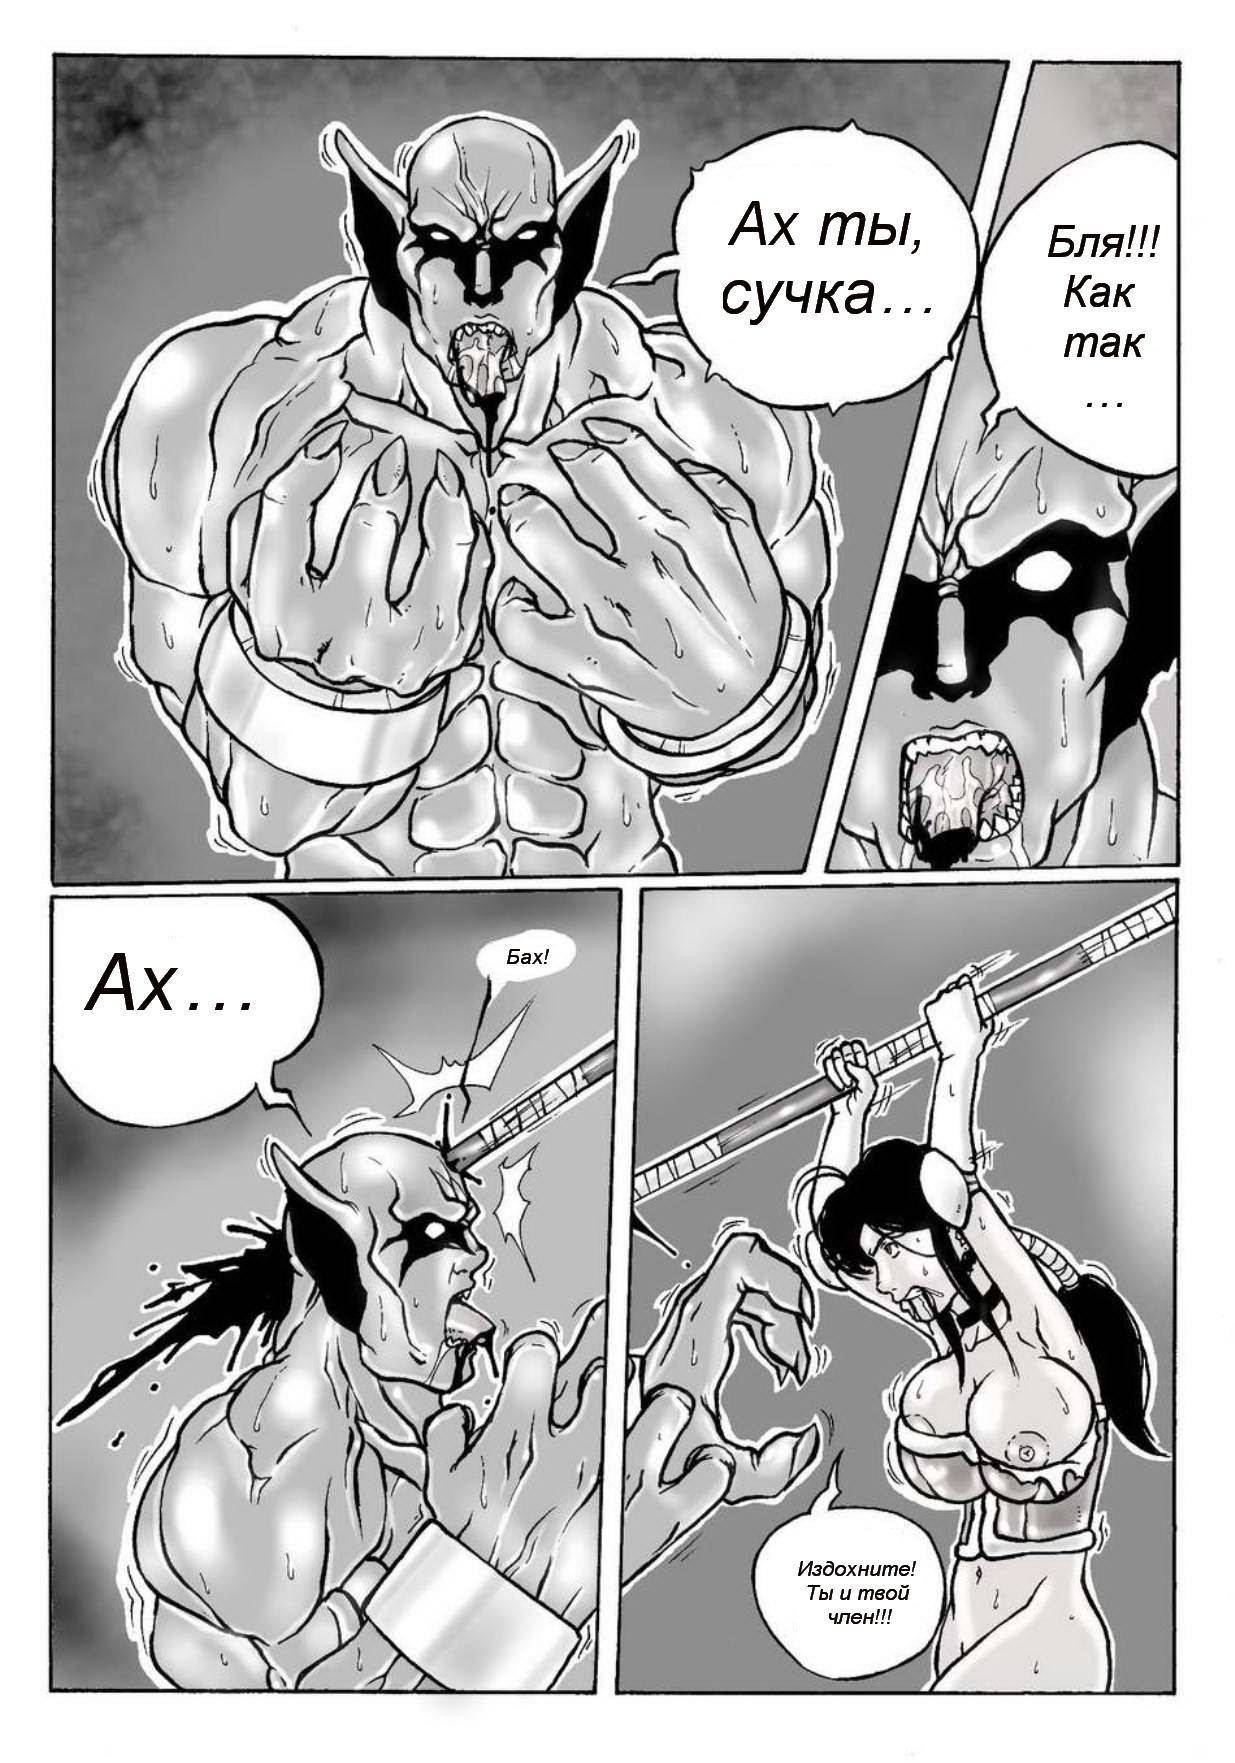 хентай порно комикс-Карина, убийца чудовищ